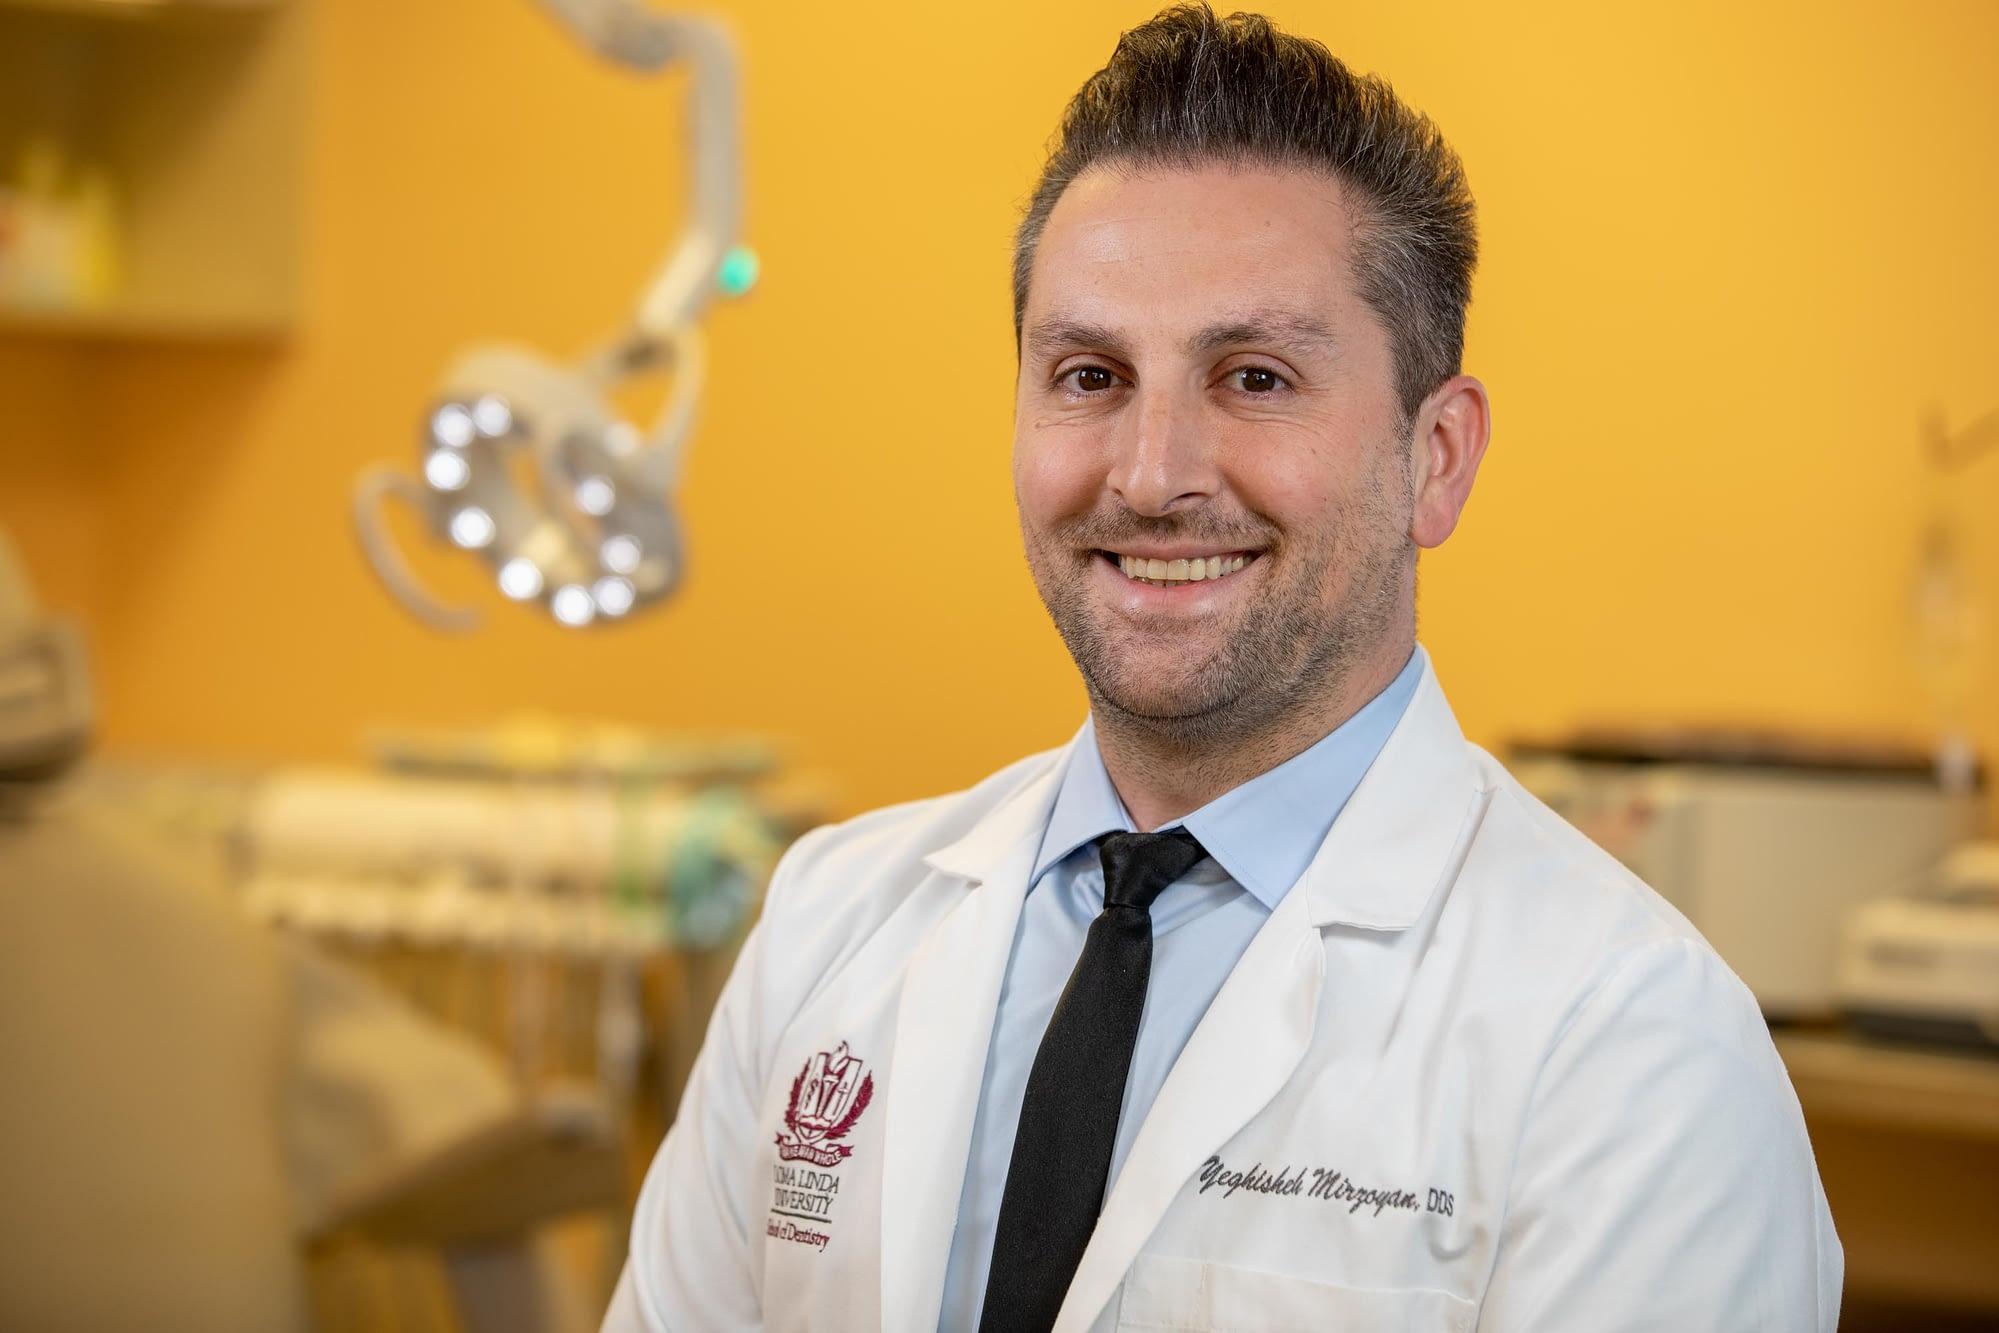 Dr Mirzoyan talking about teeth whitening Van Nuys, CA